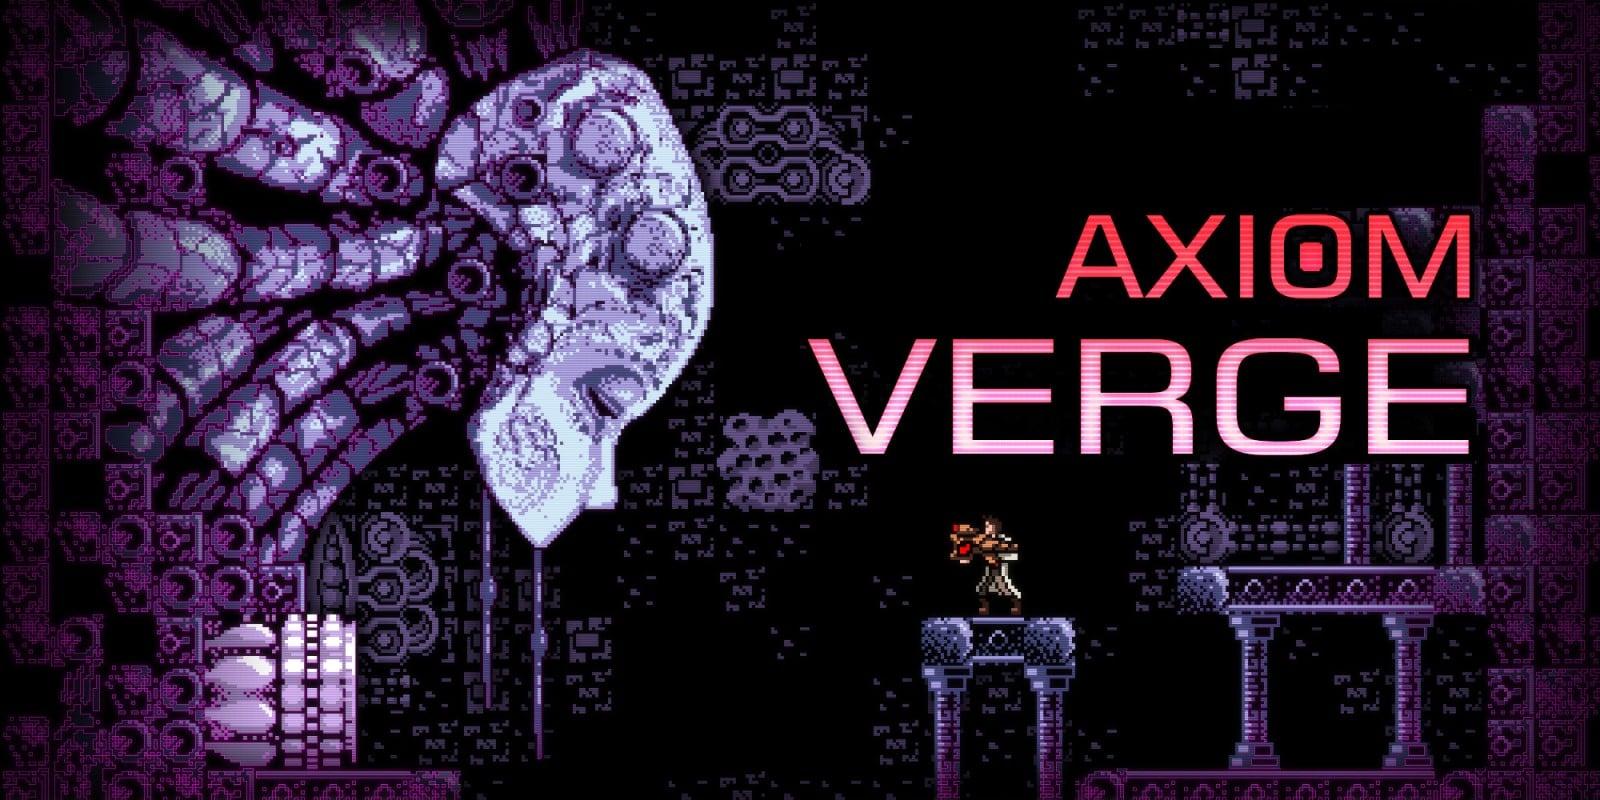 l'angolo Indie: La pixel art - SI WiiUDS AxiomVerge image1600w